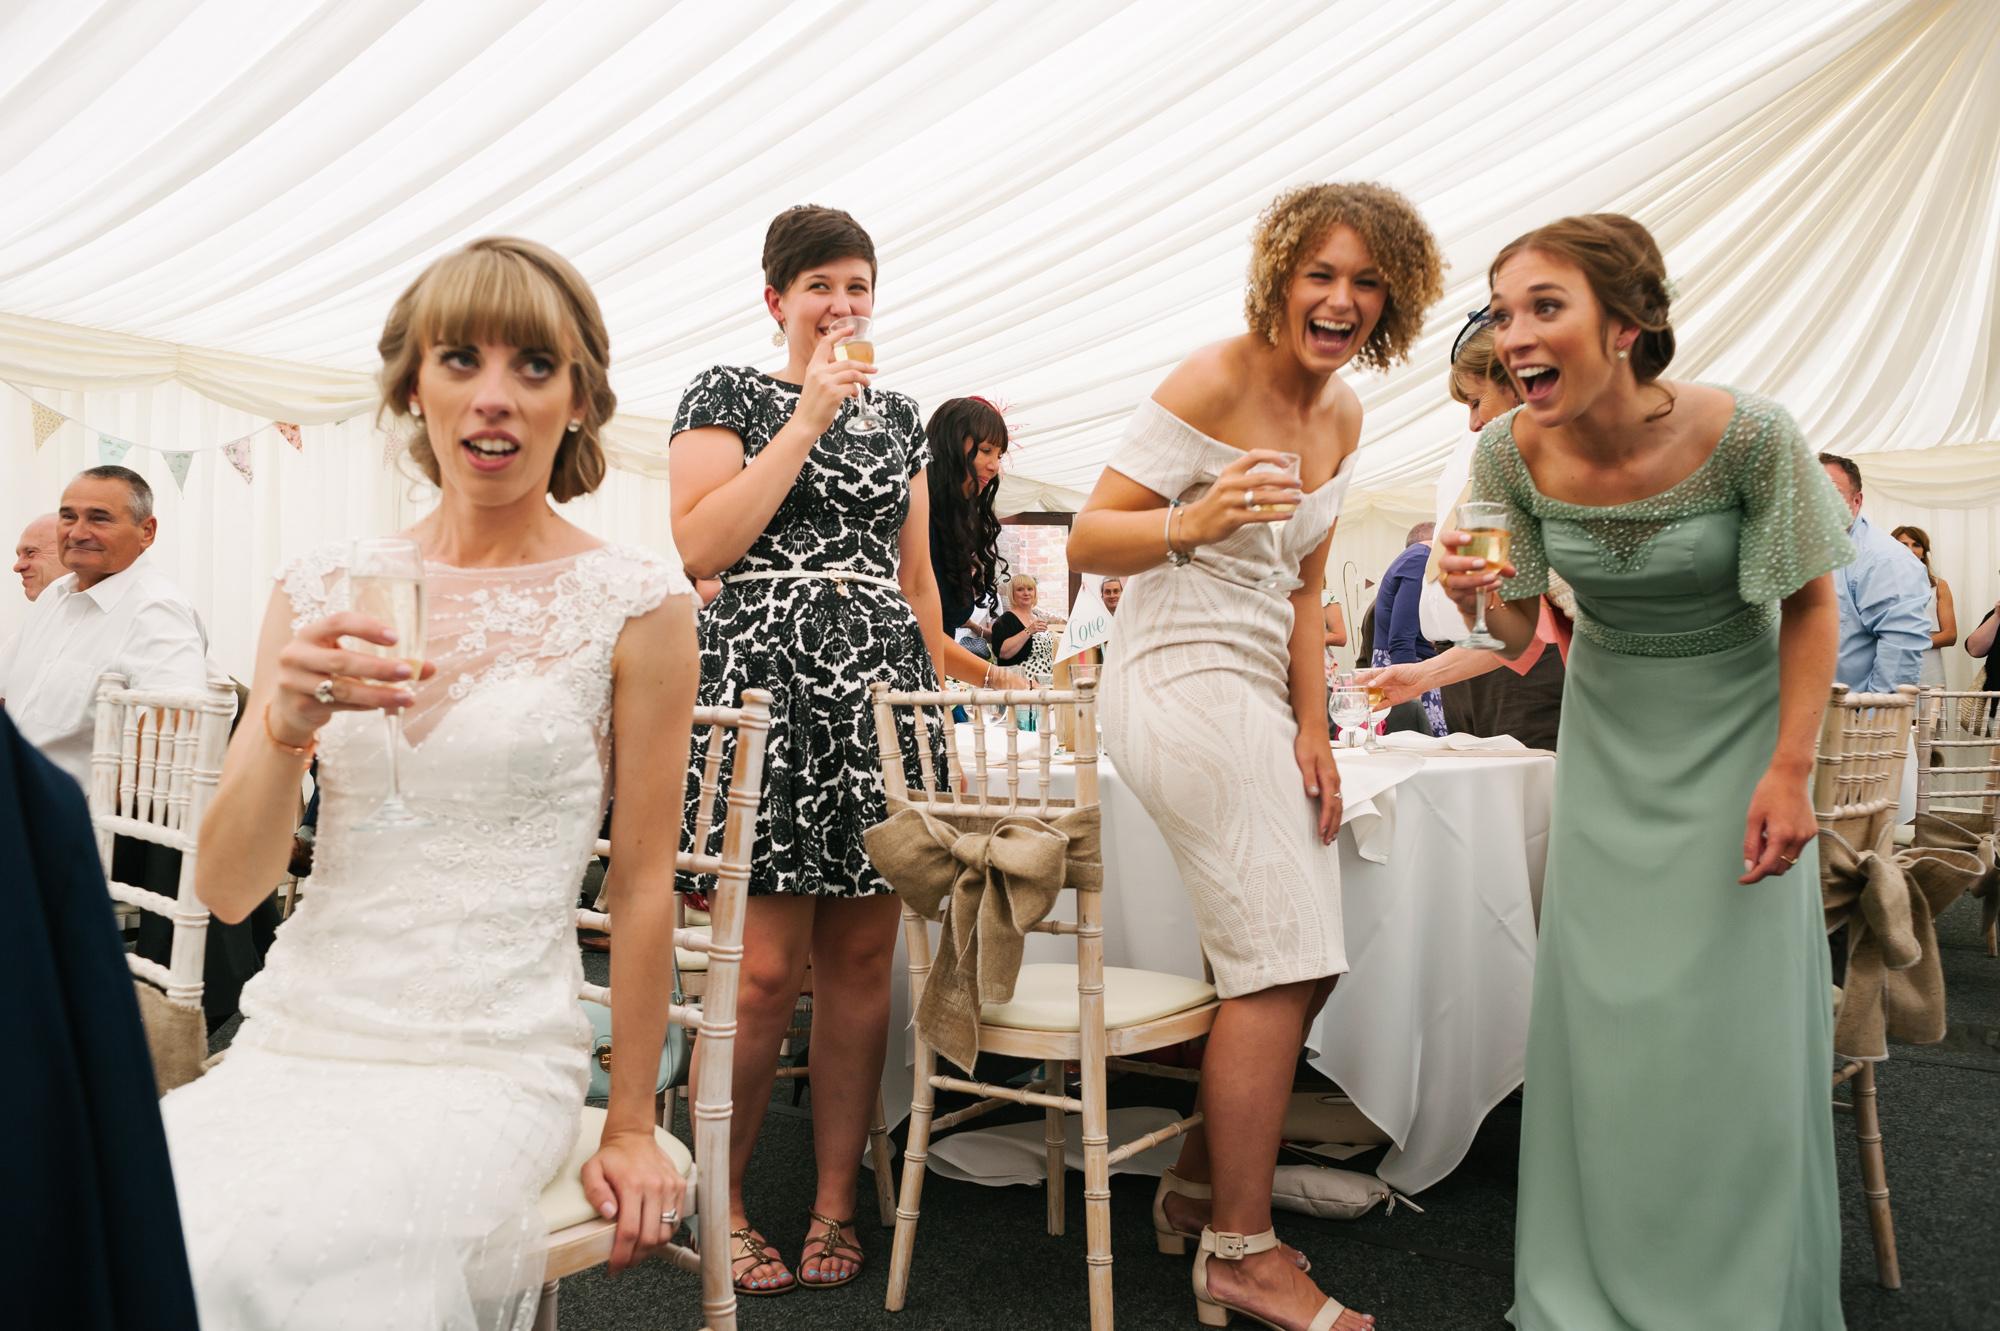 Cricket Club Wedding Tea Party Eversholt Bedfordshire-55